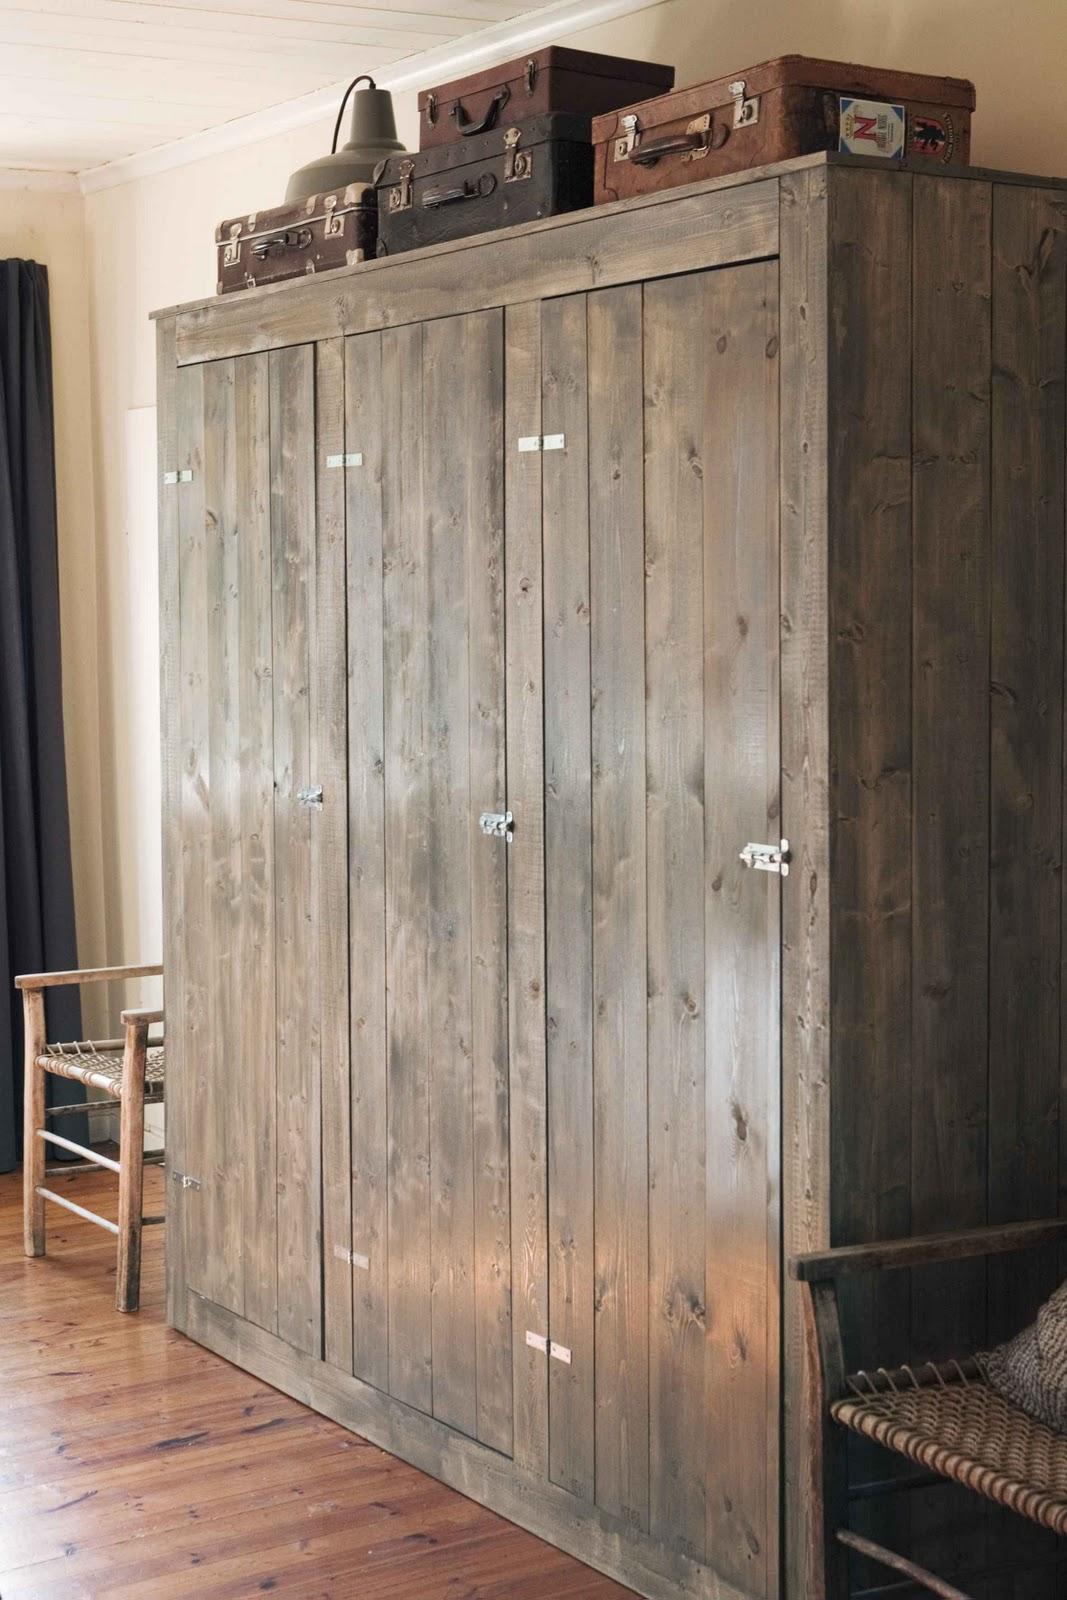 Homemade Closet Wardrobe ~ So mee cool closet